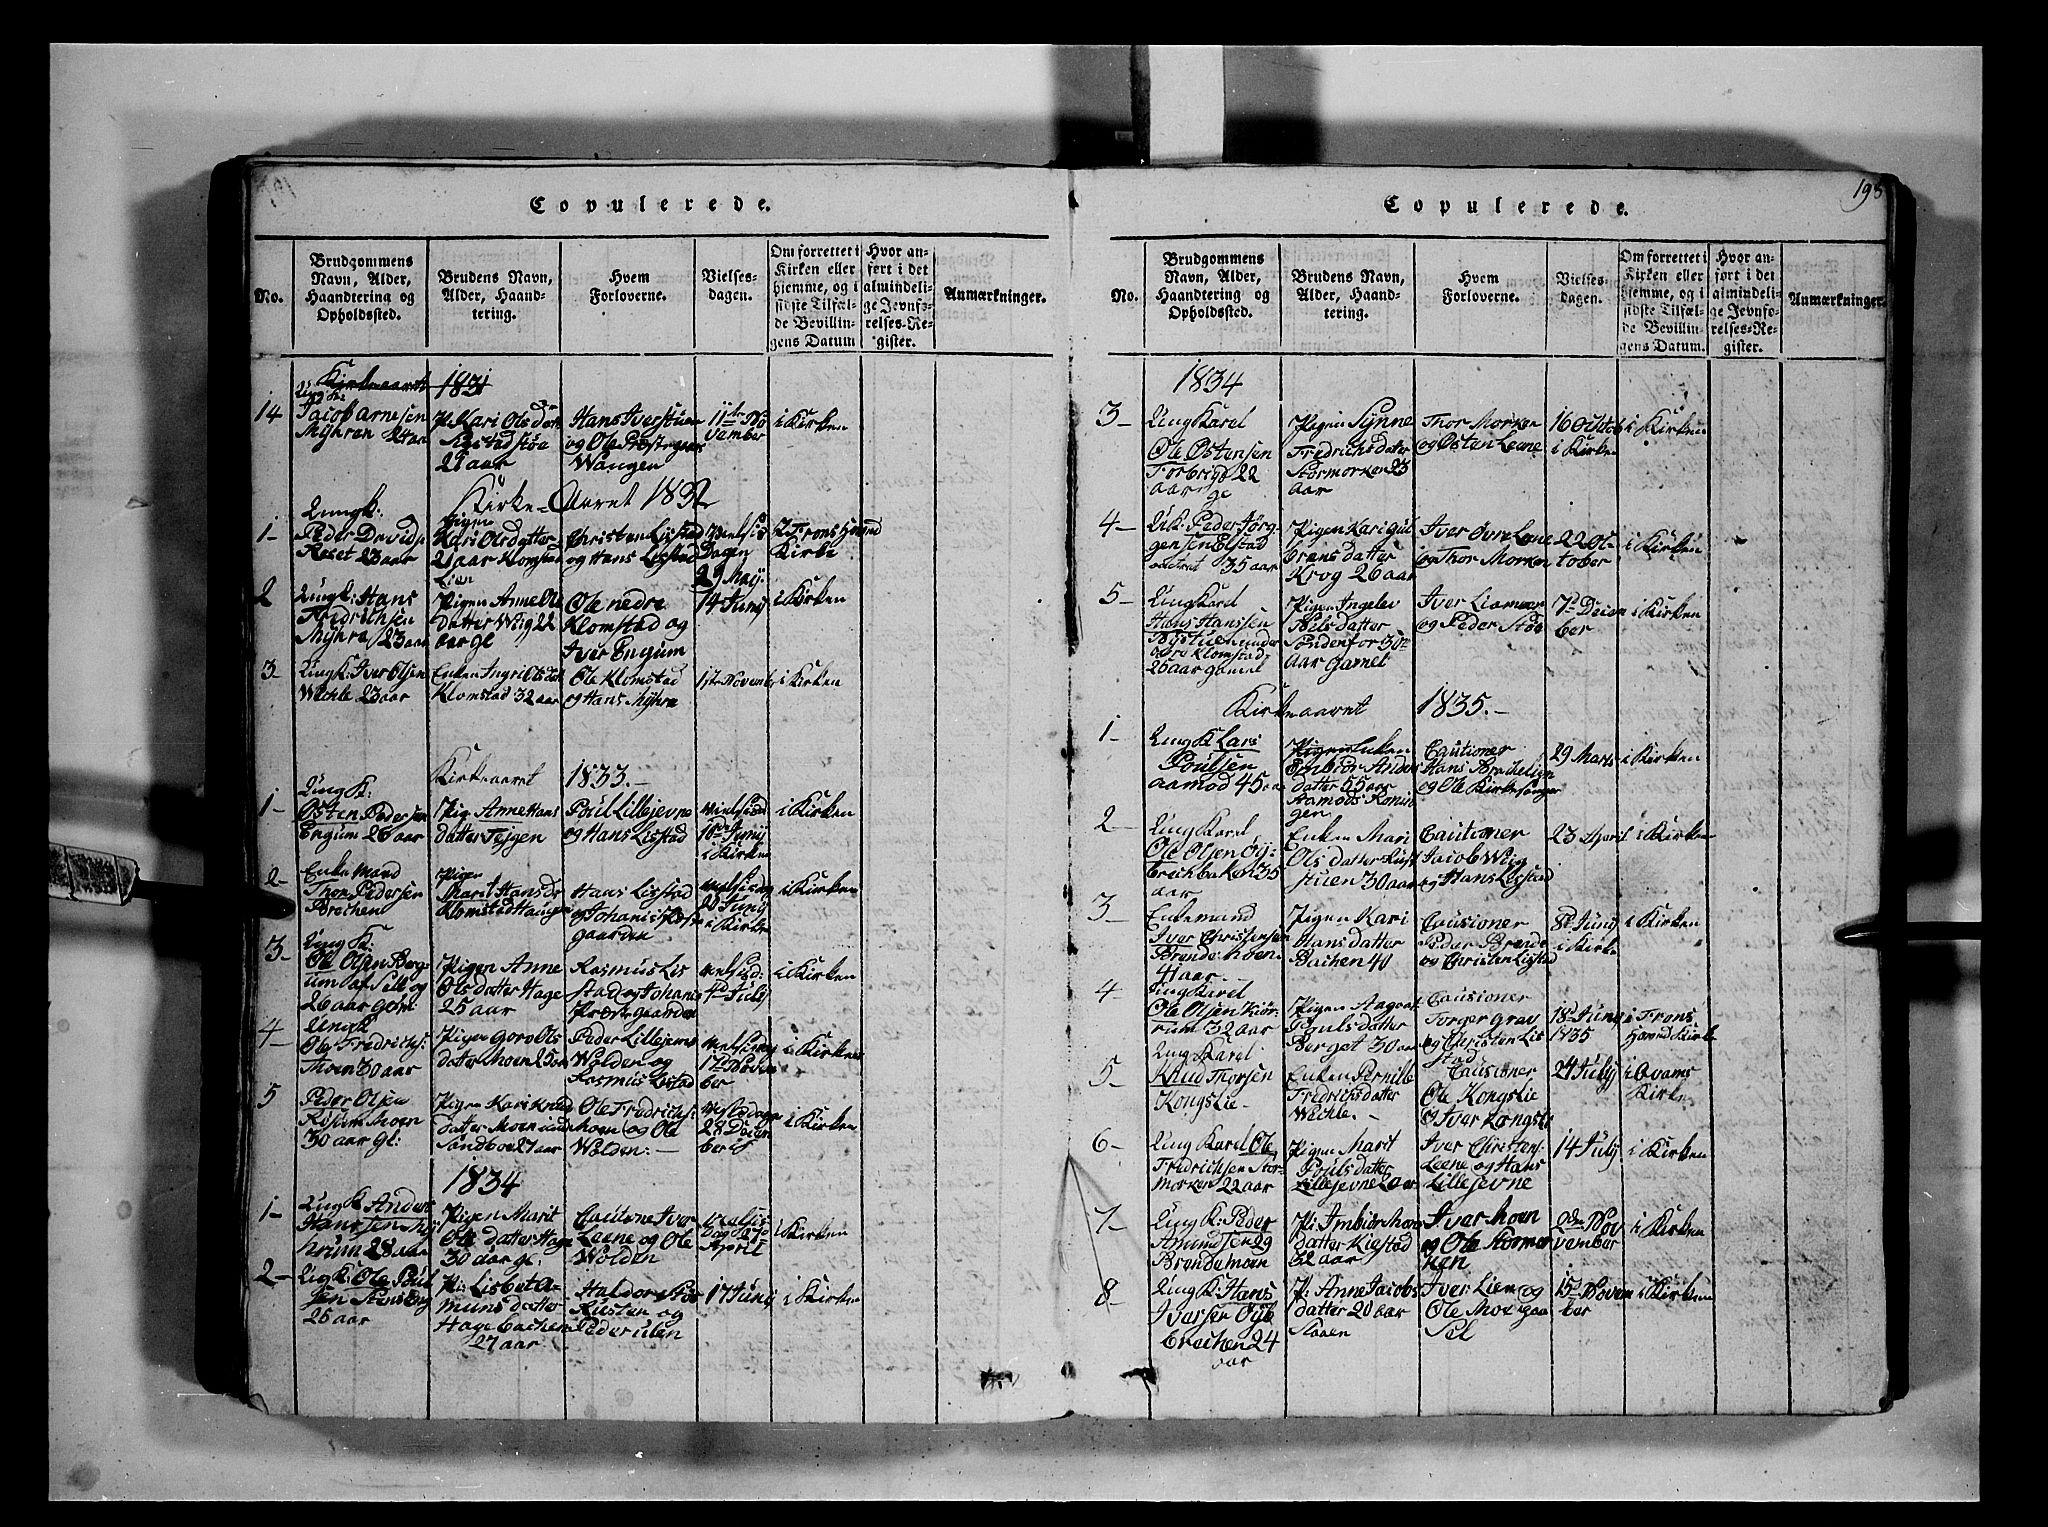 SAH, Fron prestekontor, H/Ha/Hab/L0002: Klokkerbok nr. 2, 1816-1850, s. 198